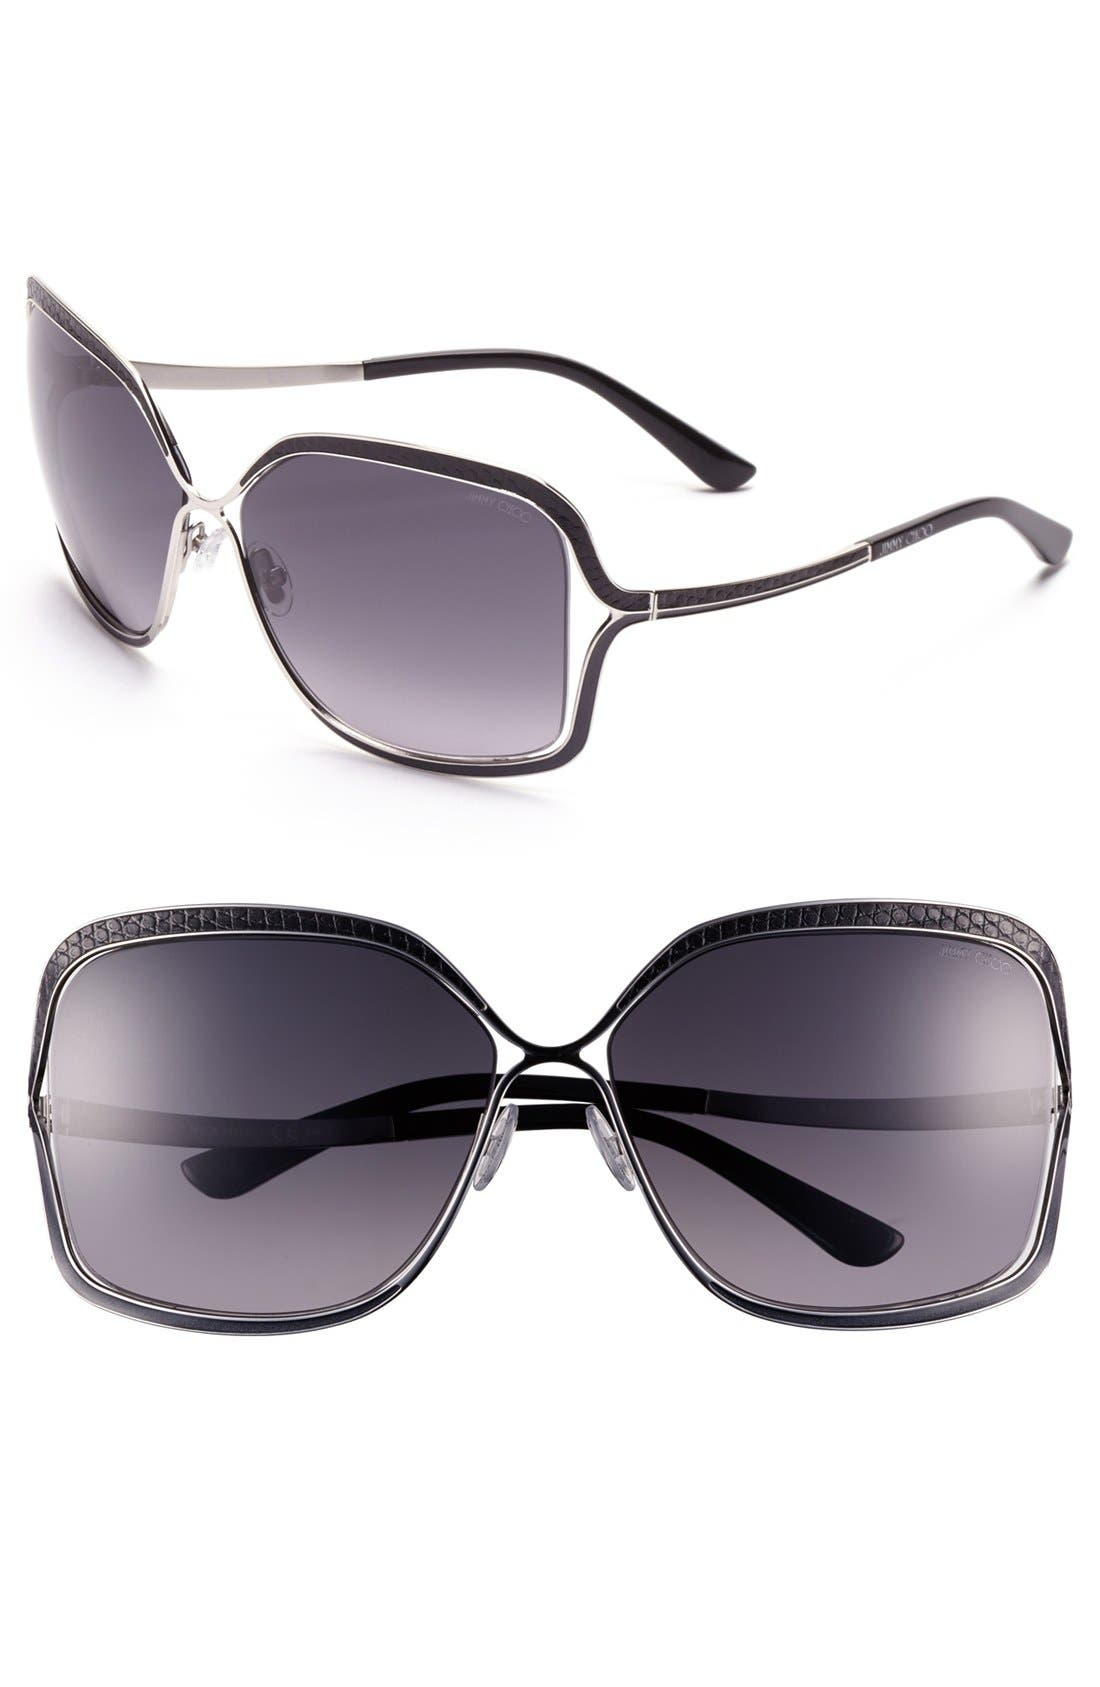 Alternate Image 1 Selected - Jimmy Choo 63mm Oversized Sunglasses